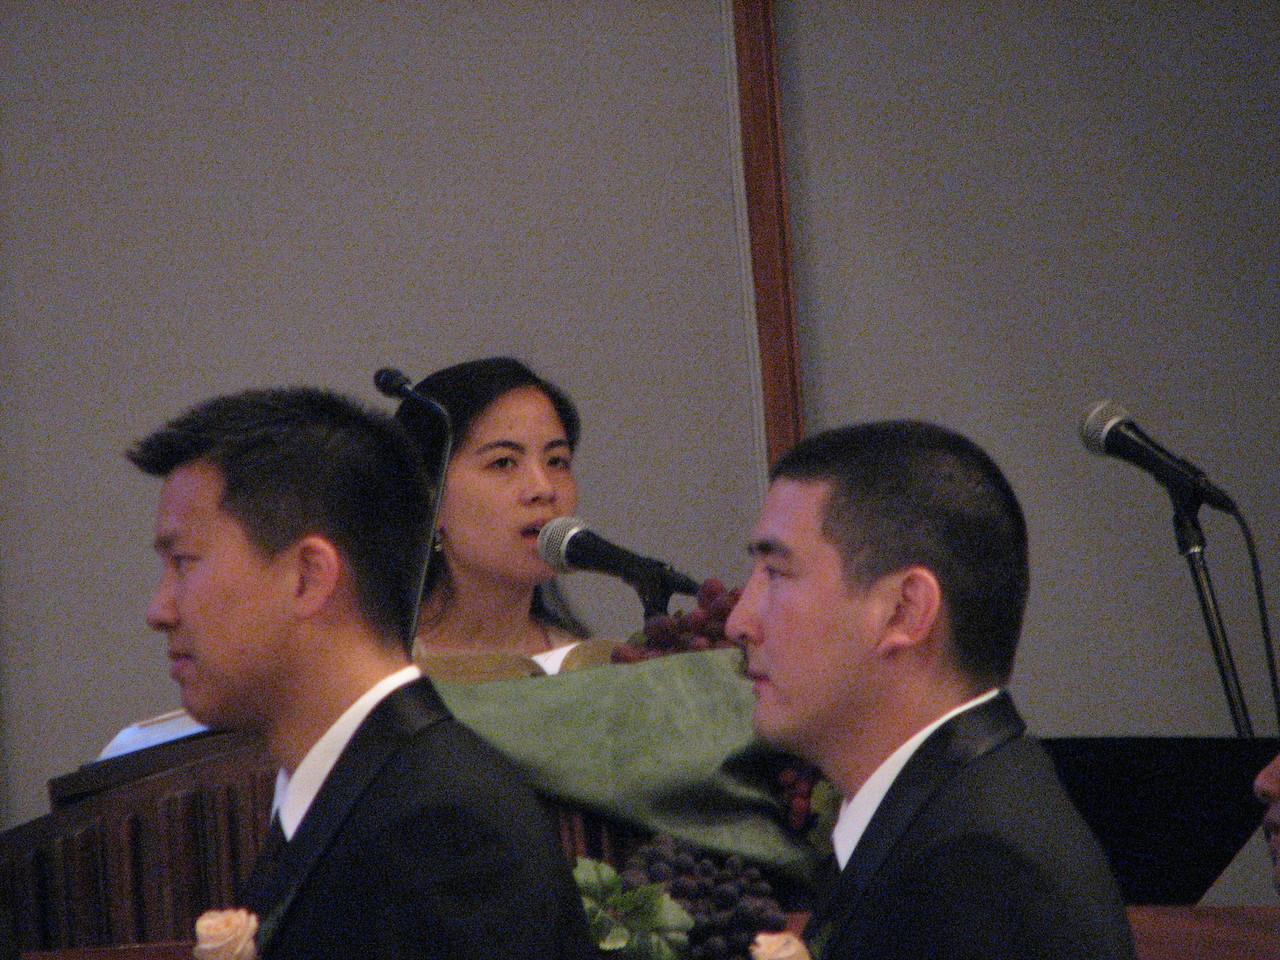 2007 06 09 Sat - Wedding singer - Audrey Wu